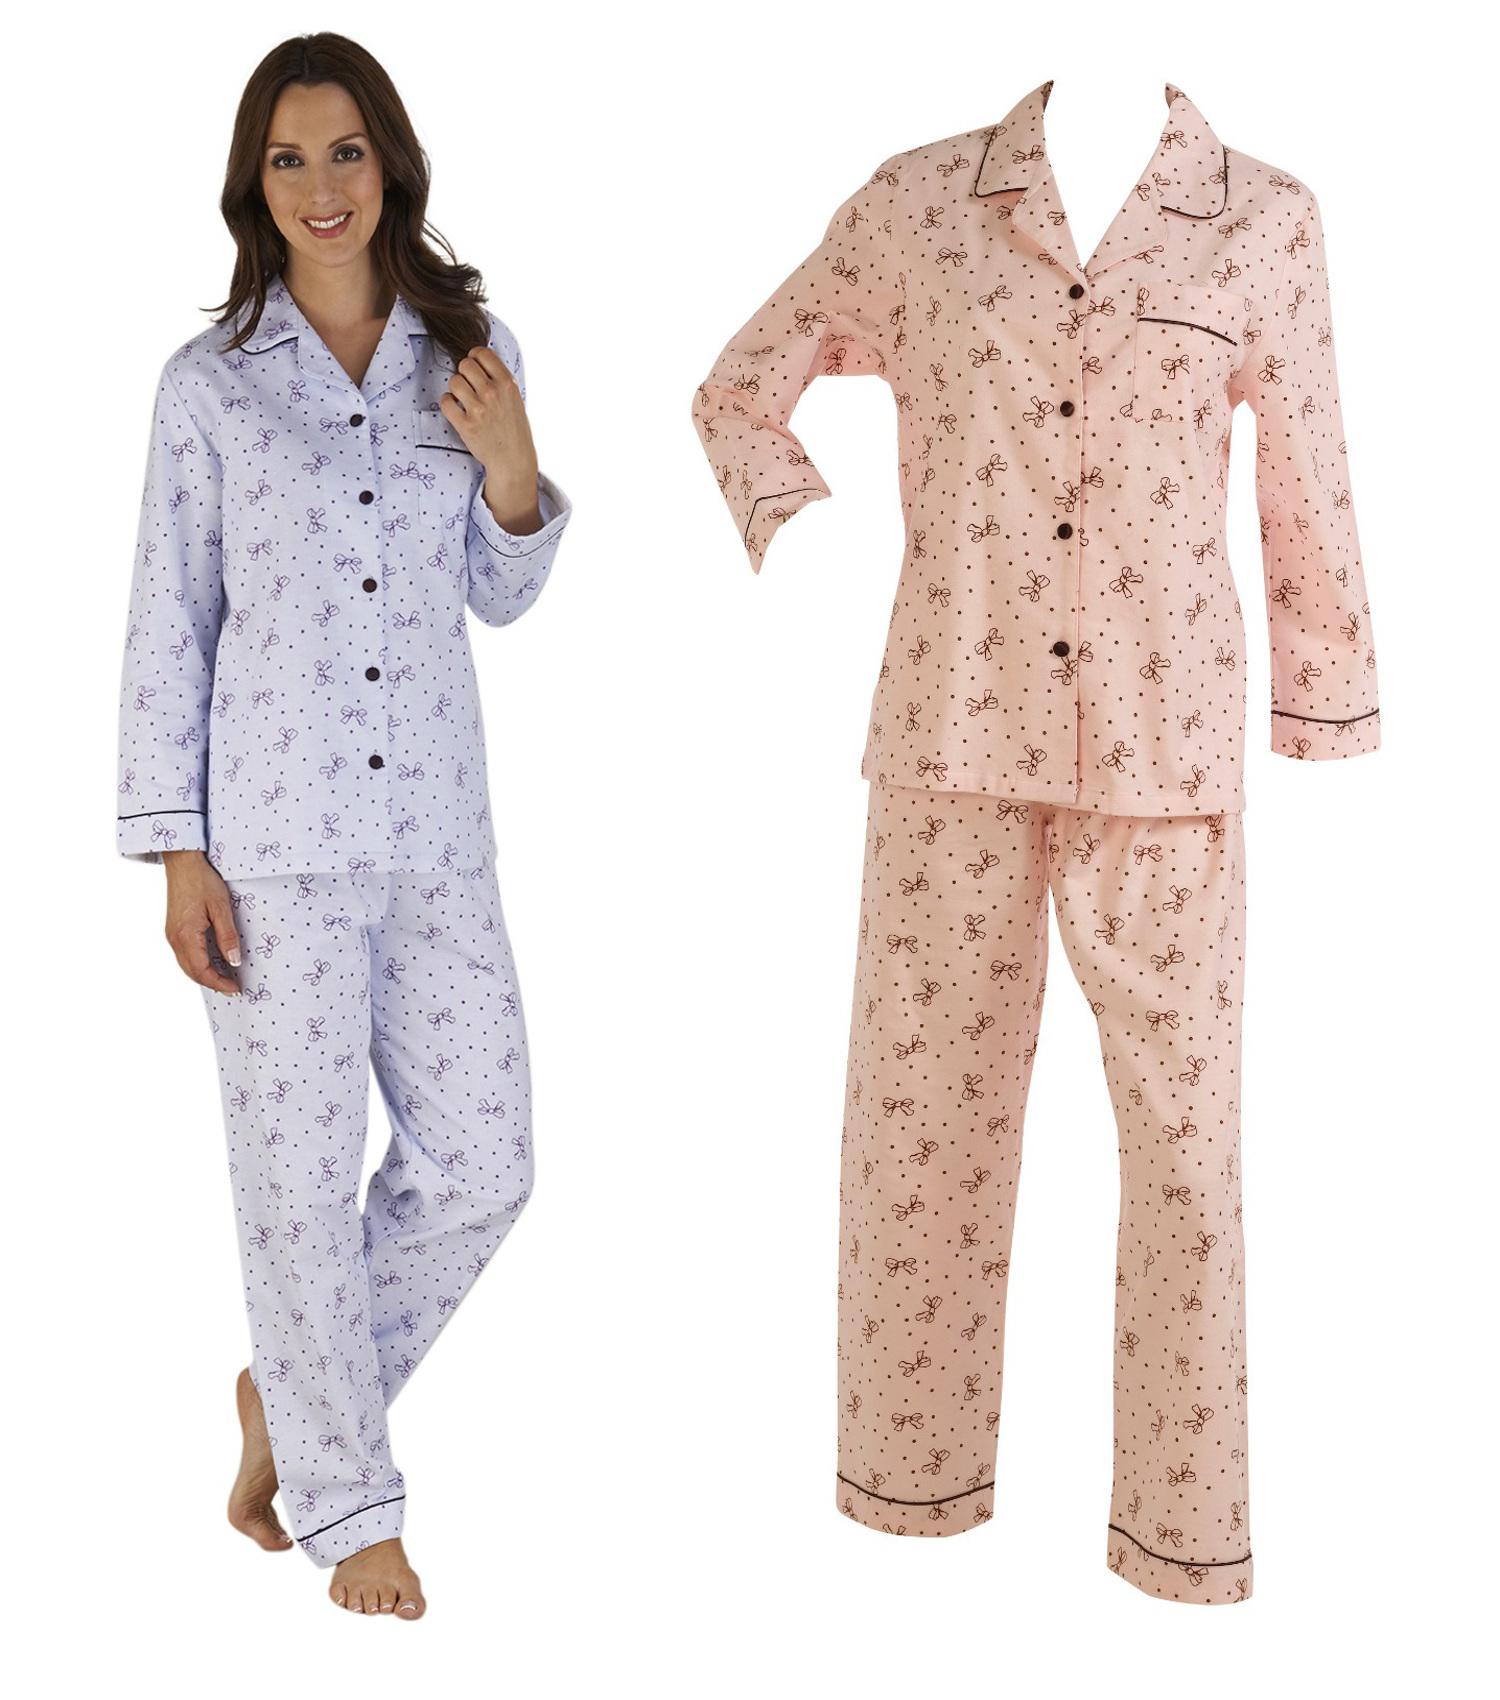 Details about Ladies Soft Winceyette Brushed Cotton PJs Set Slenderella  Bows Polka Dot Pyjamas 1a08cc9cf